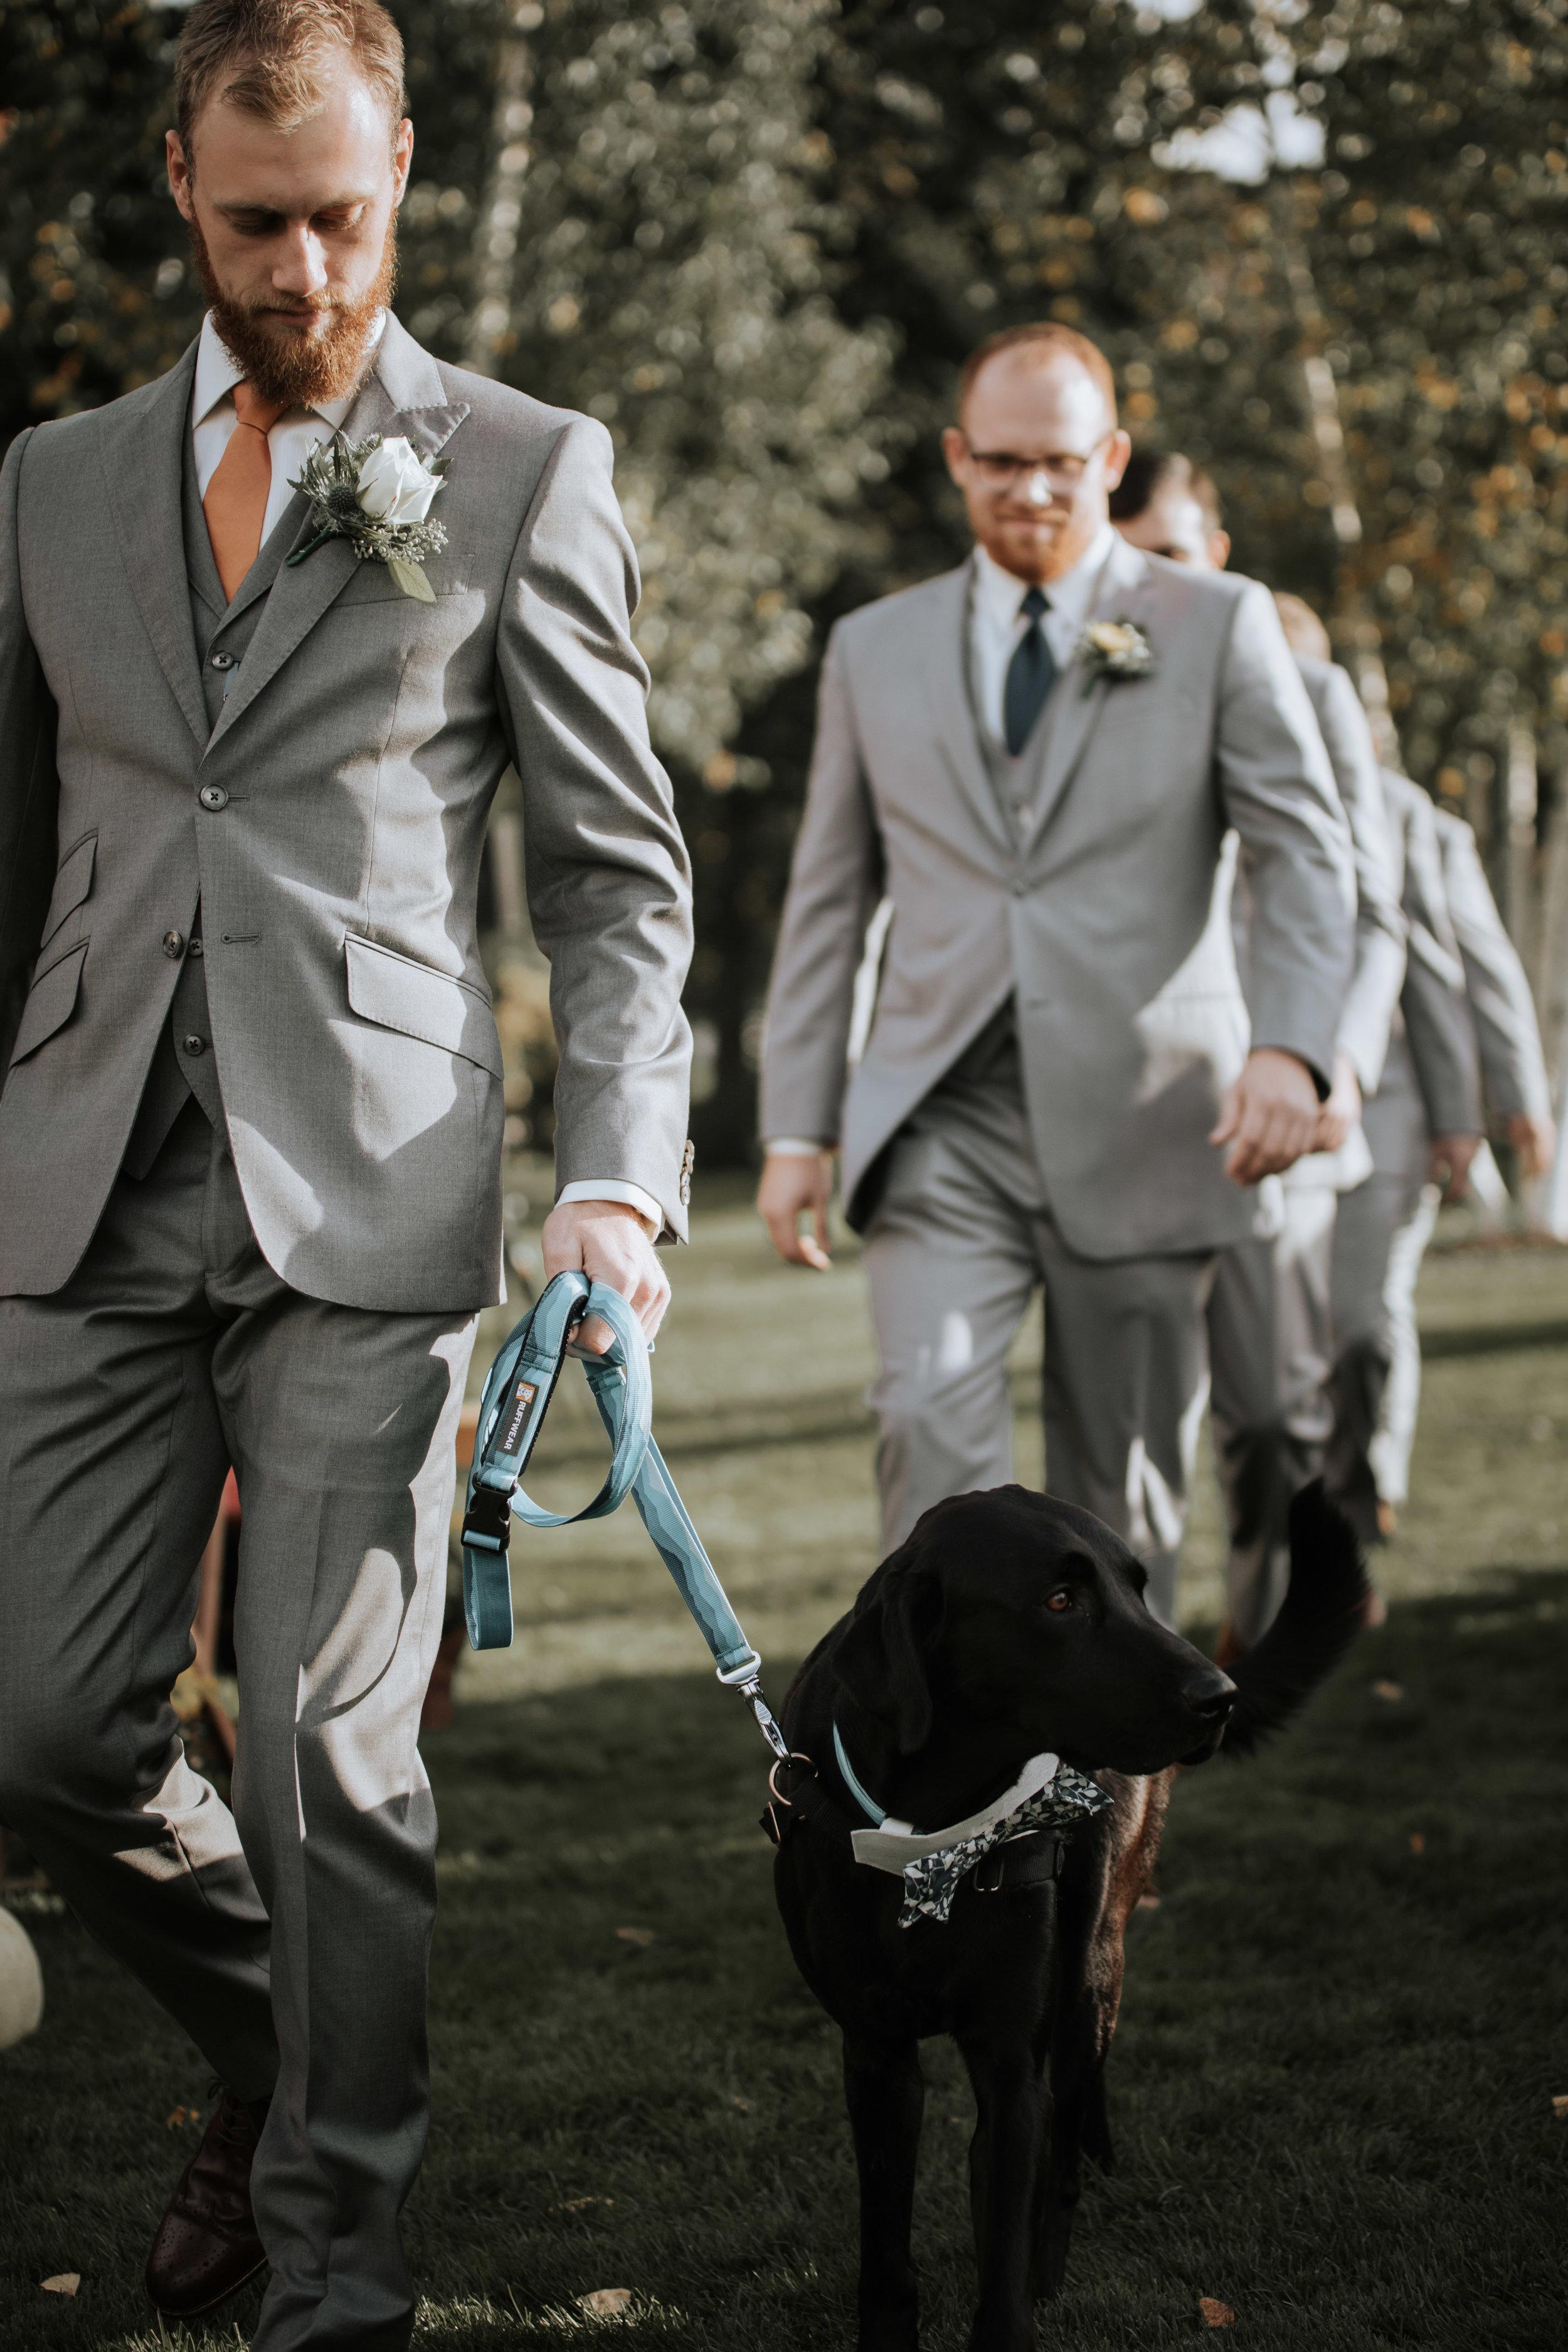 Vermont Wedding | Lorianna Weathers Photography-0394.jpg